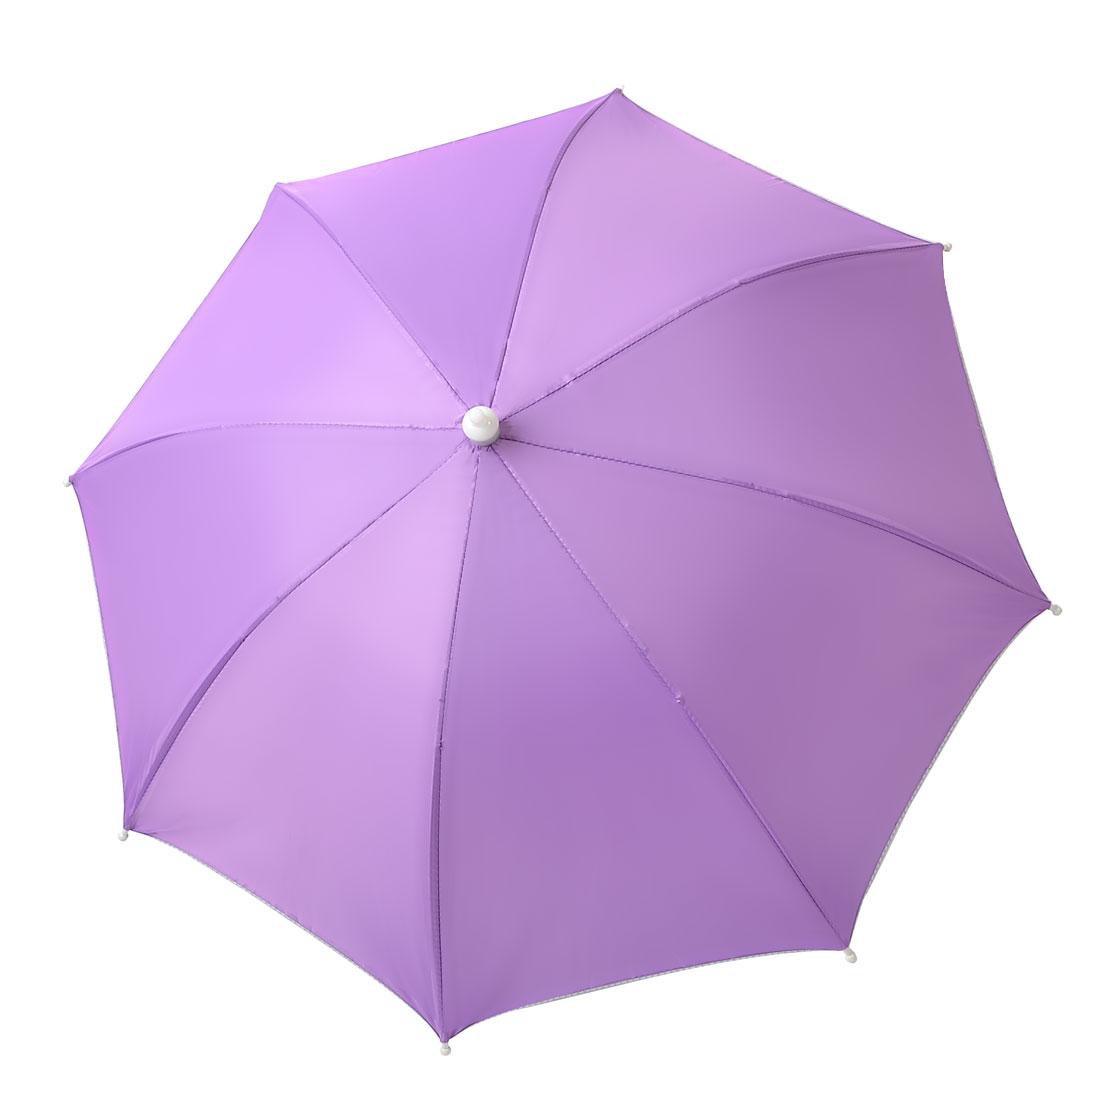 Outdoors Sports Purple Elastic Headband Handfree Umbrella Headwear Hat